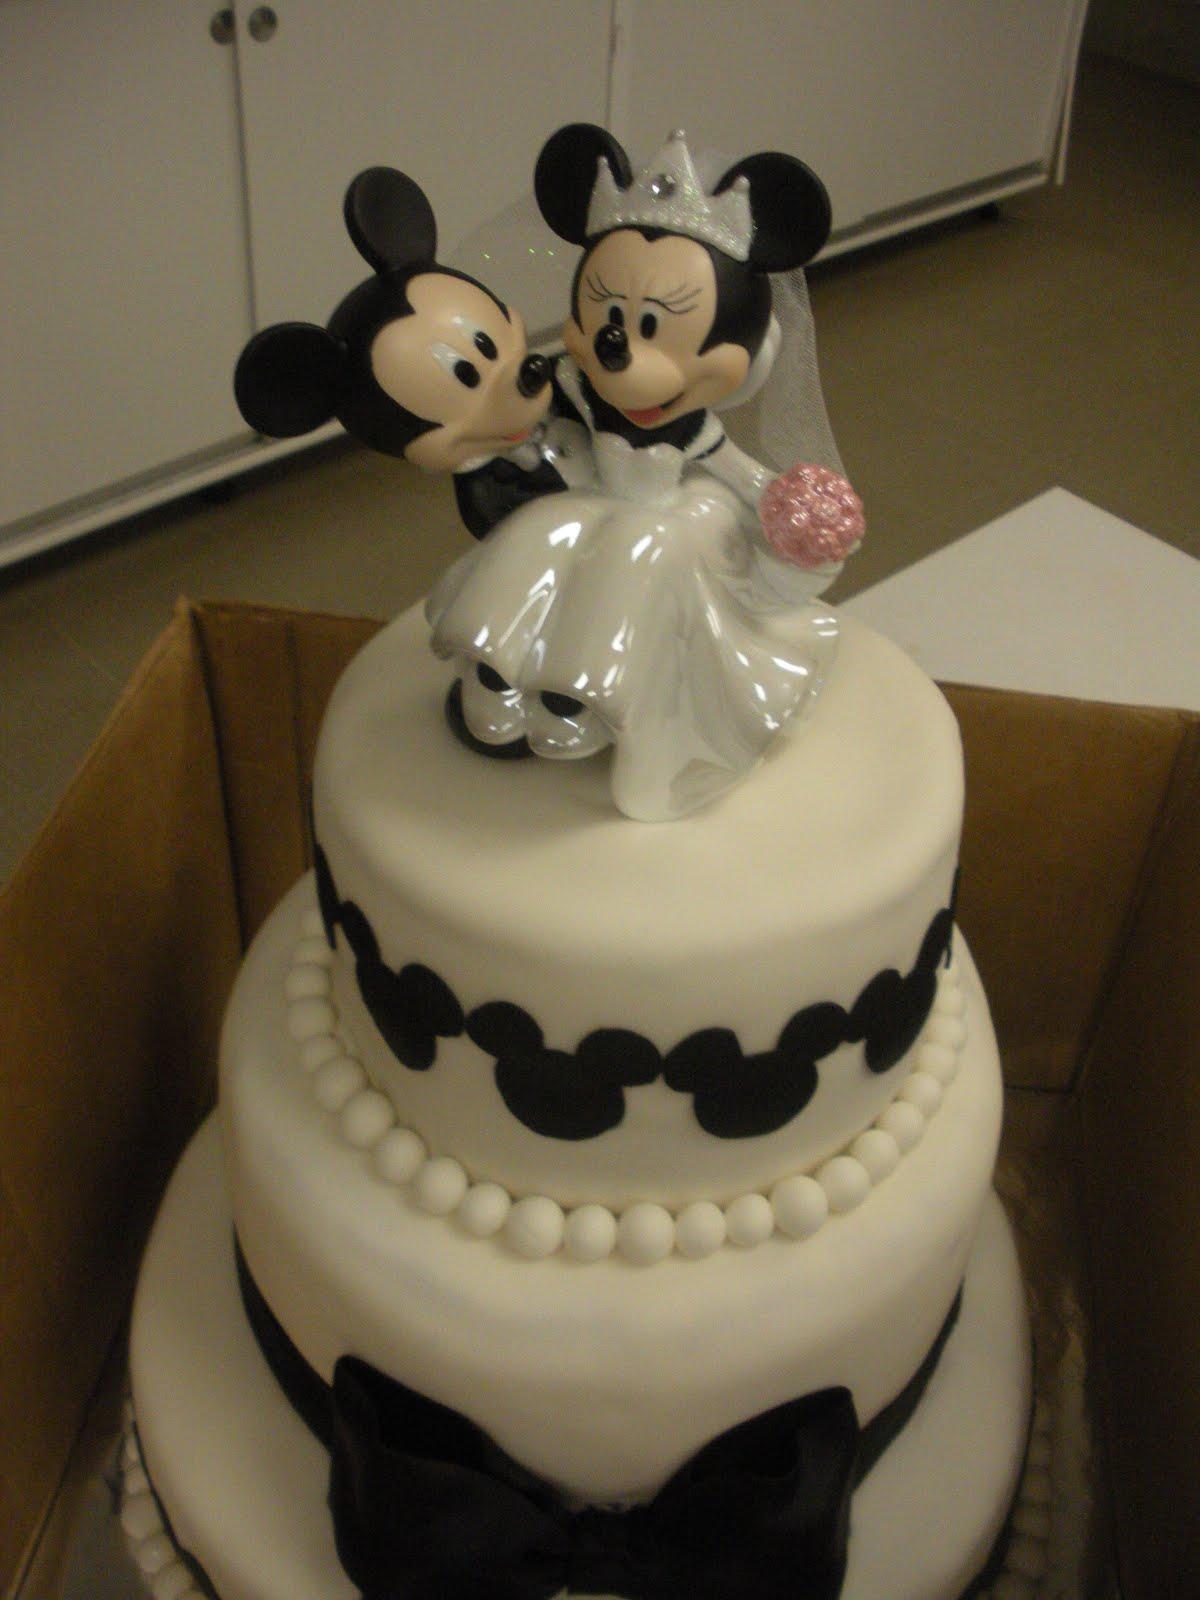 Beachy Cakes Cookie Monster Amp Disney Wedding